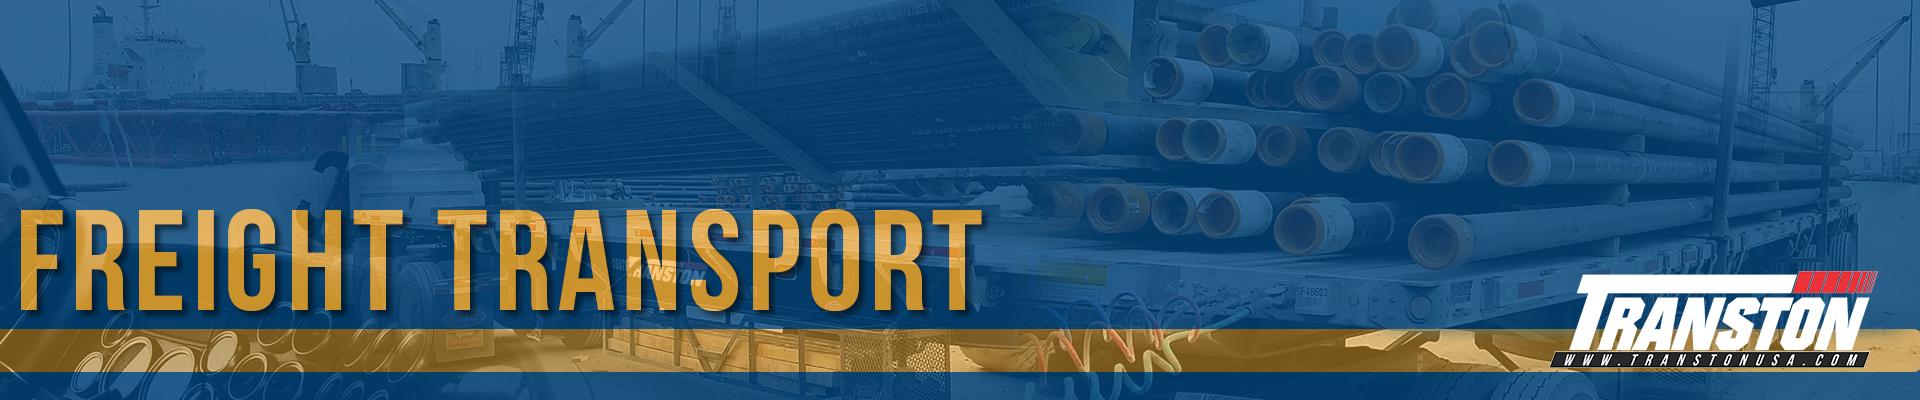 Houston Freight Transport Company